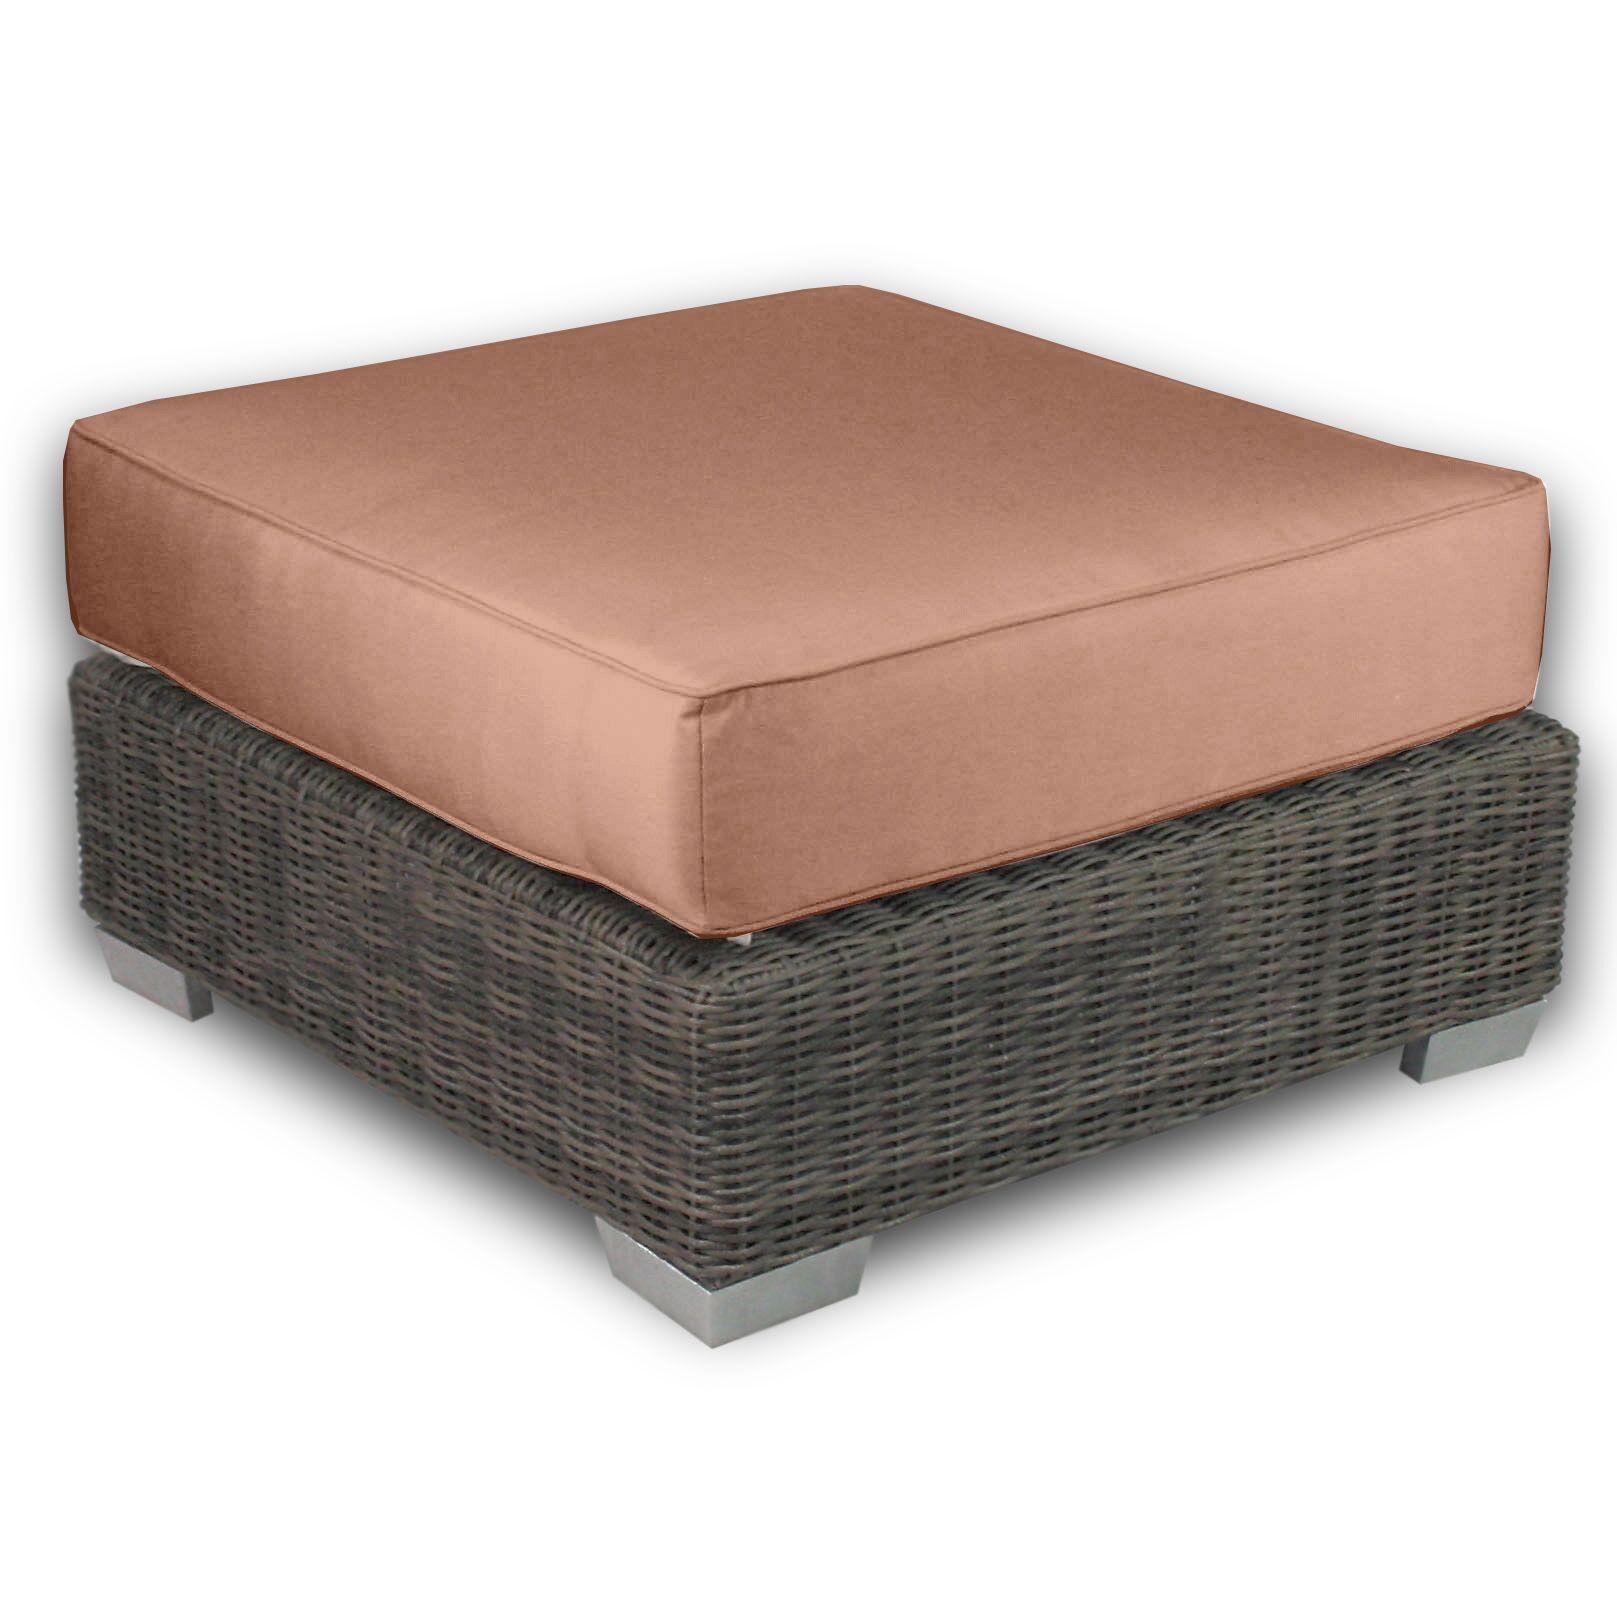 Palisades Ottoman with Cushion Fabric: Cayenne